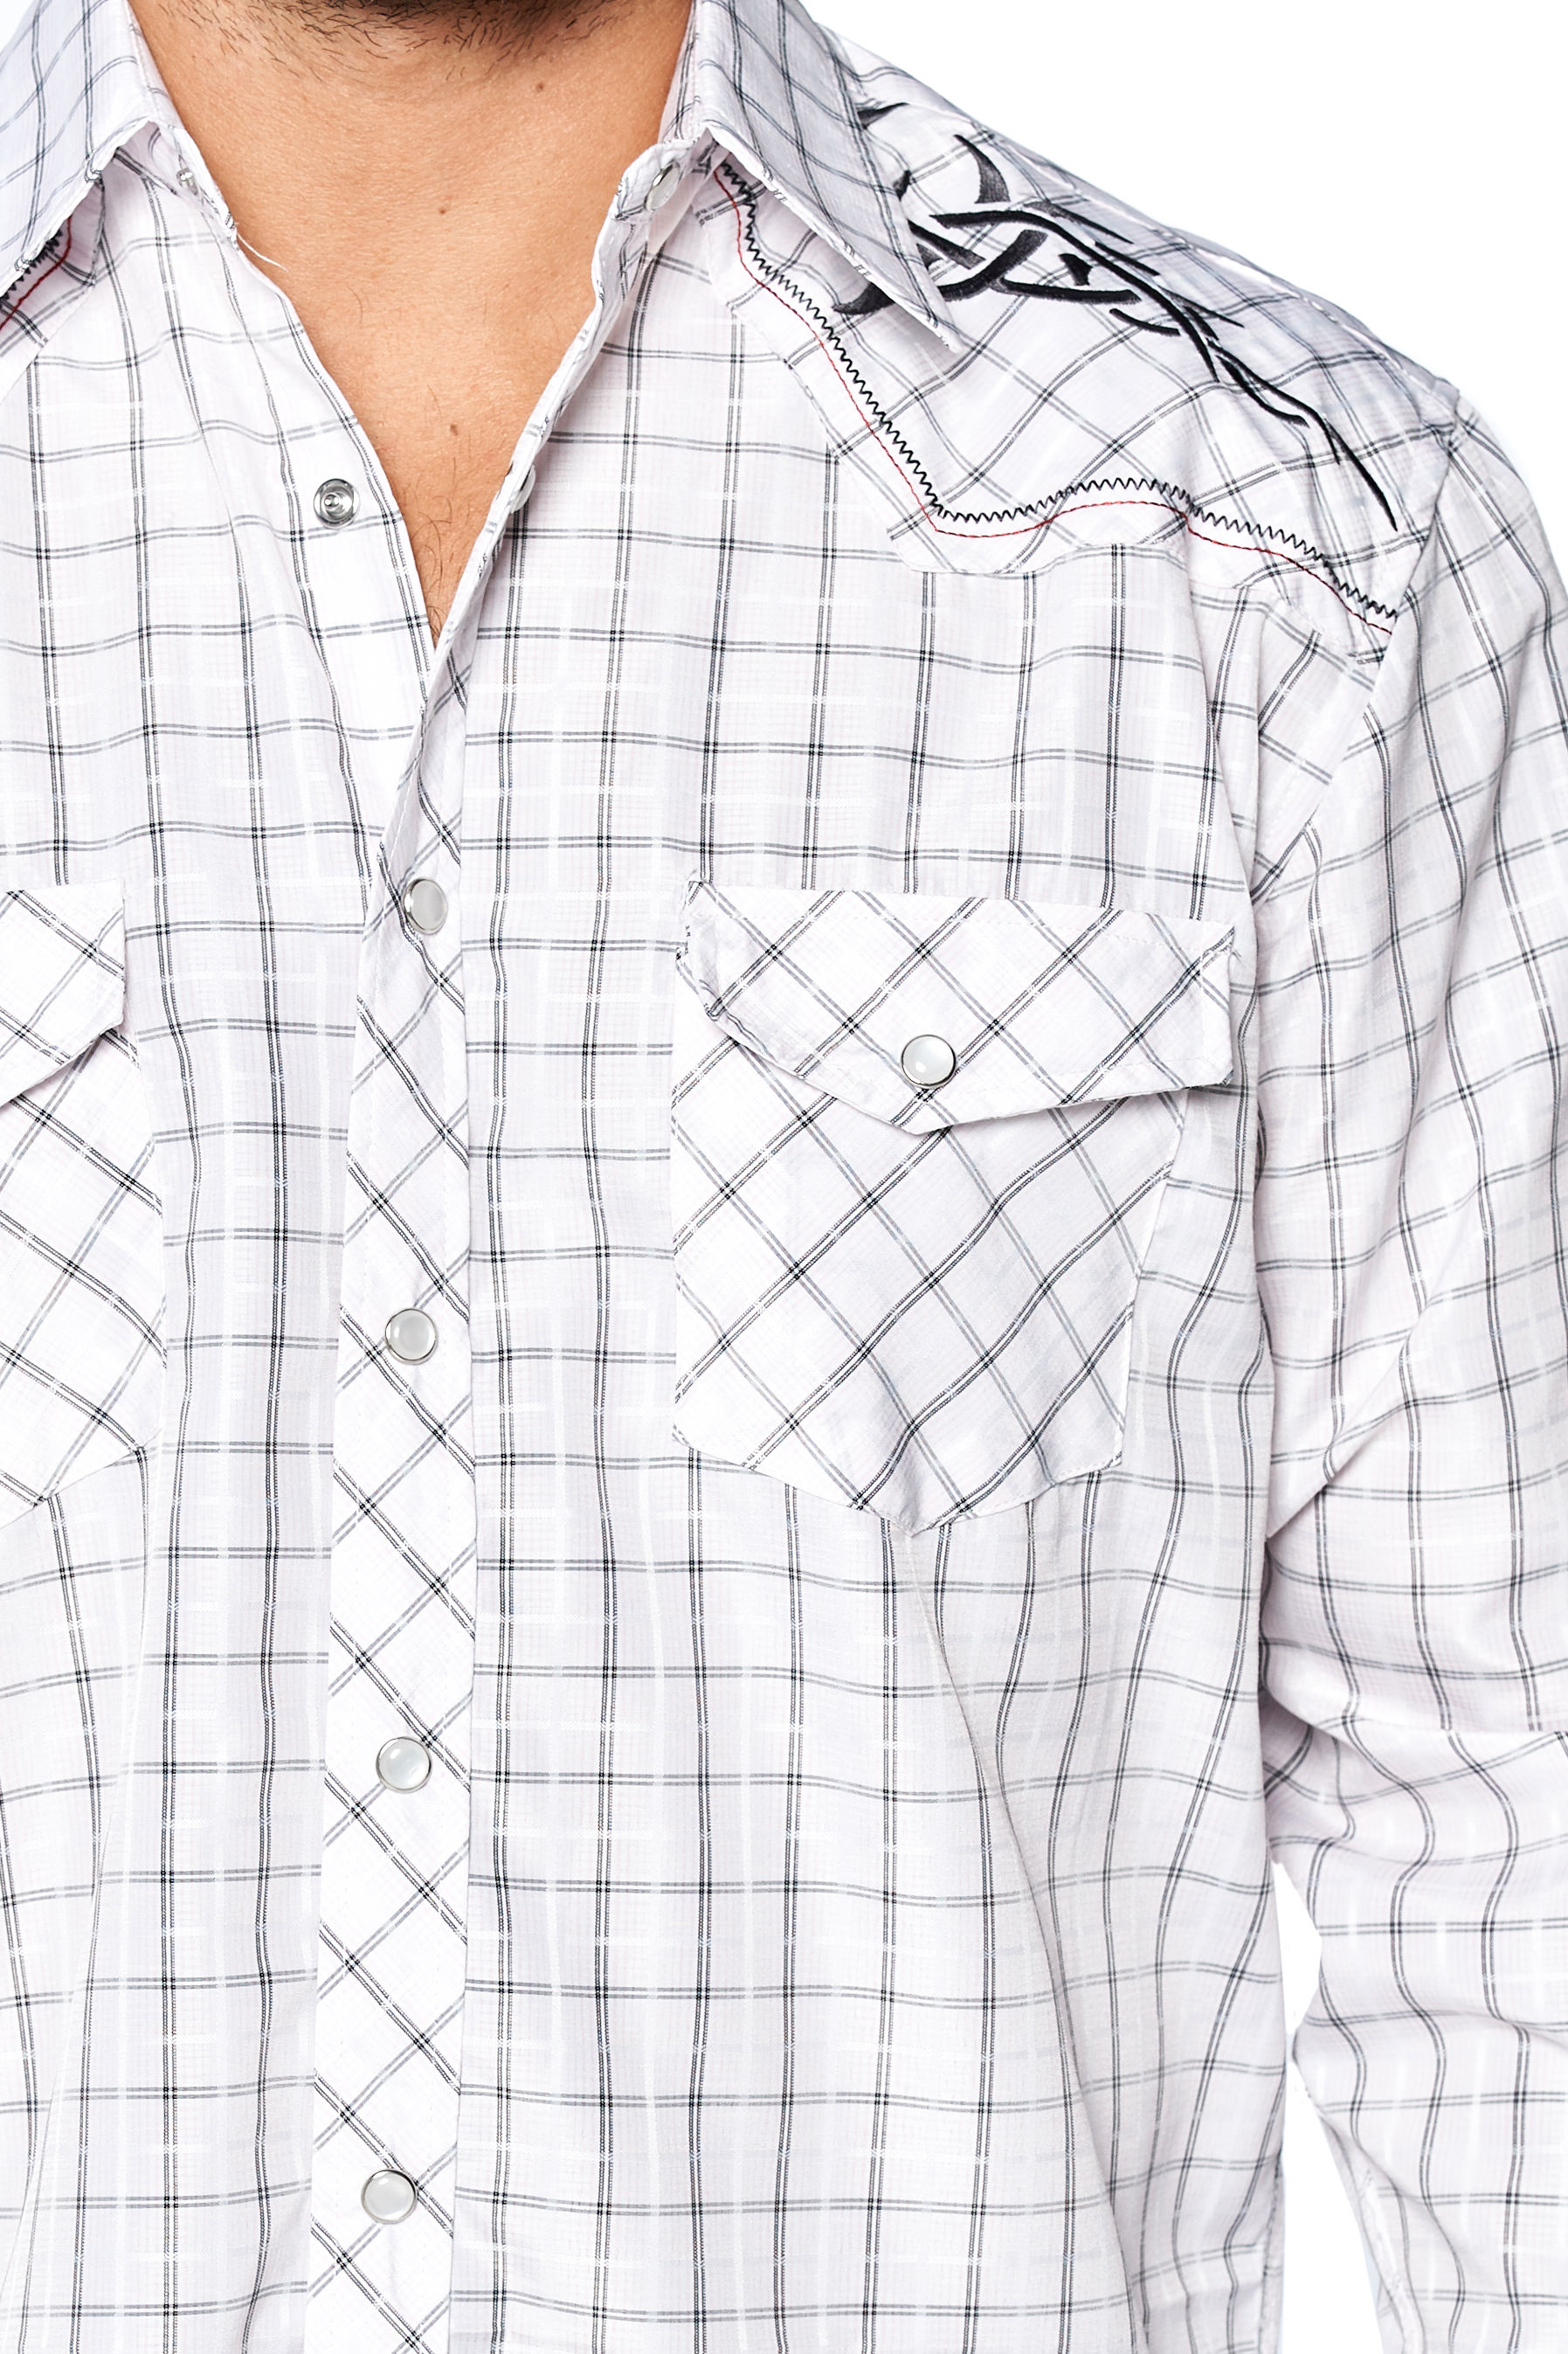 LW-Men-039-s-Pearl-Snap-Tribal-Stylish-Printed-Woven-Western-Vaquero-Rodeo-Shirt thumbnail 69